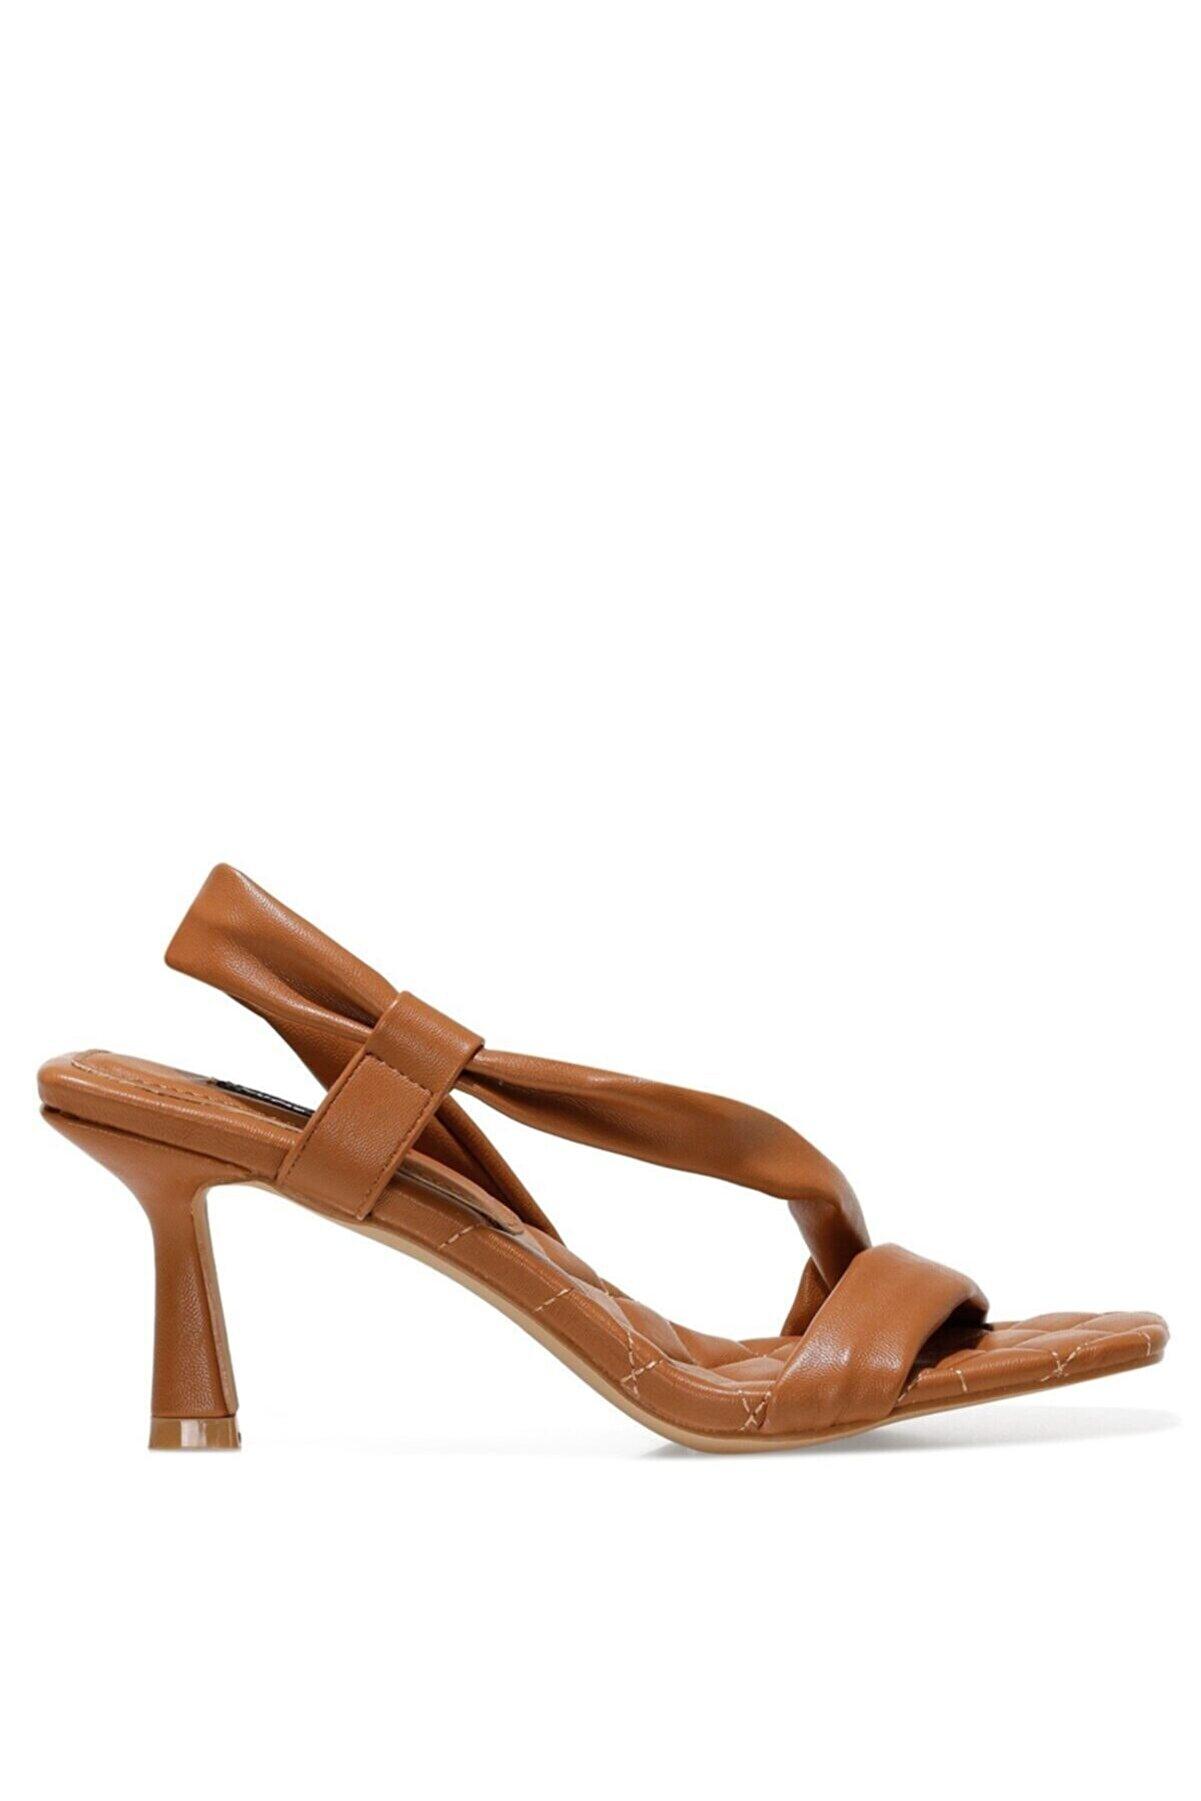 Nine West PALMER 1 FX Naturel Kadın Sandalet 101030313